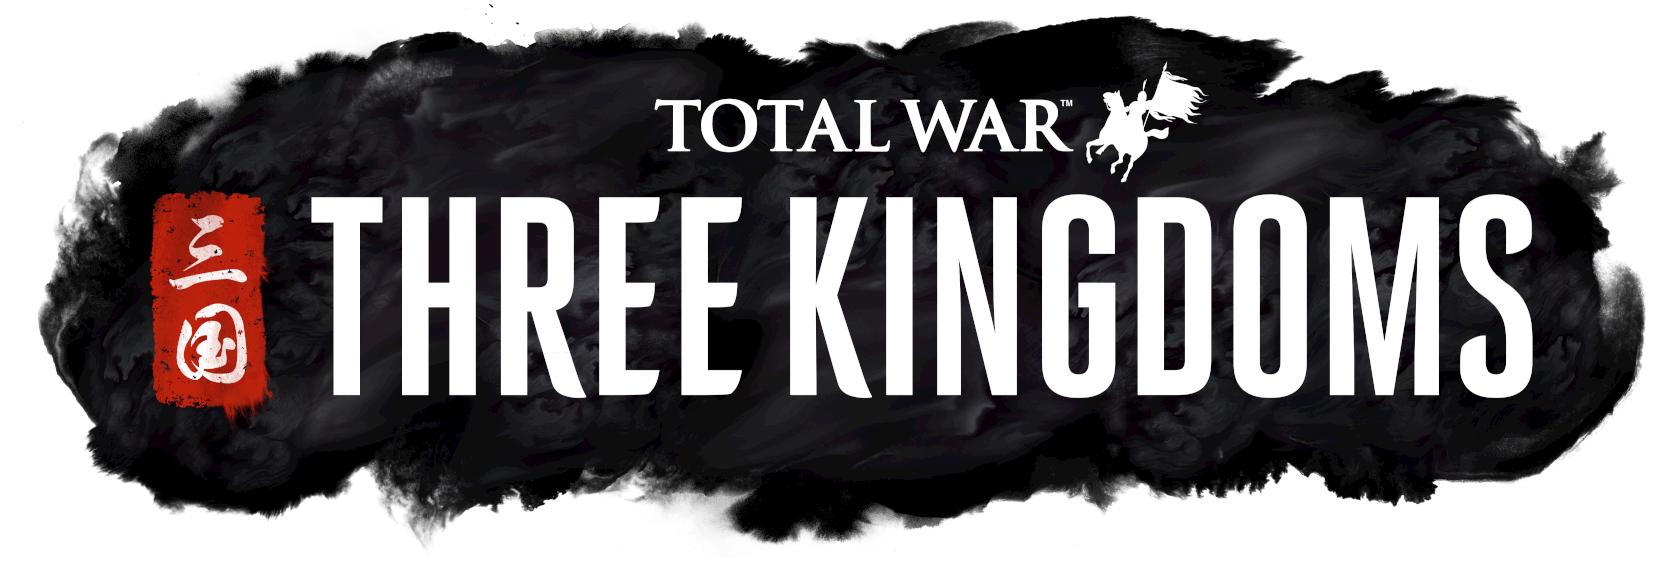 Total-War-Three-Kingdoms-Impressions-Battle-for-China-01-Header-2060x783.png